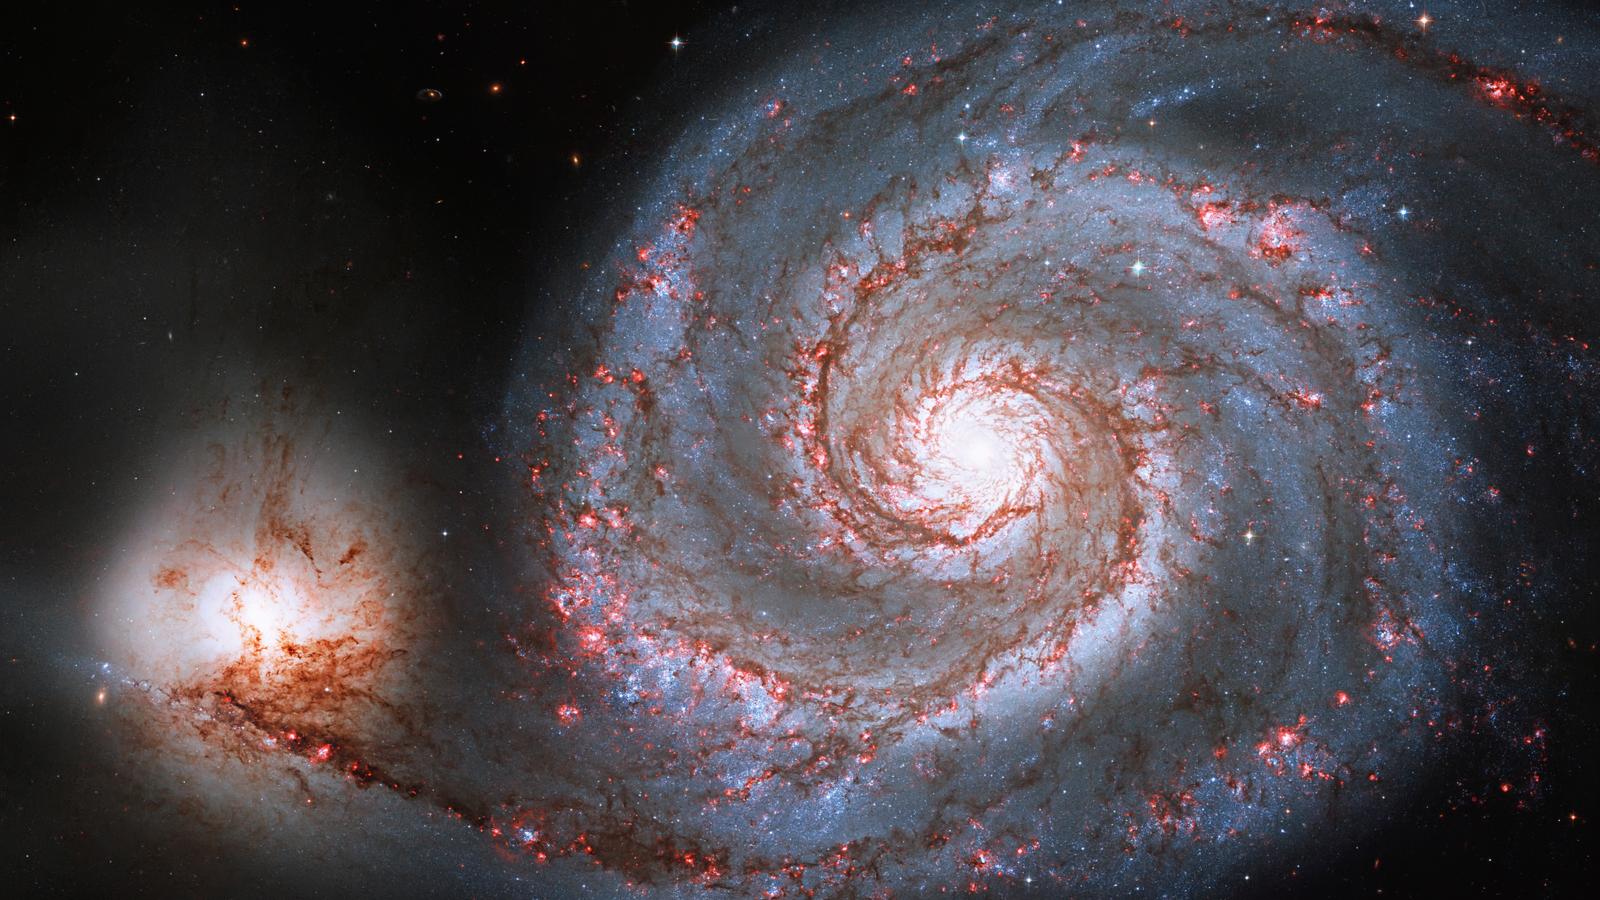 Spiral galaxy M51 or NGC 5194, the Whirlpool Galaxy